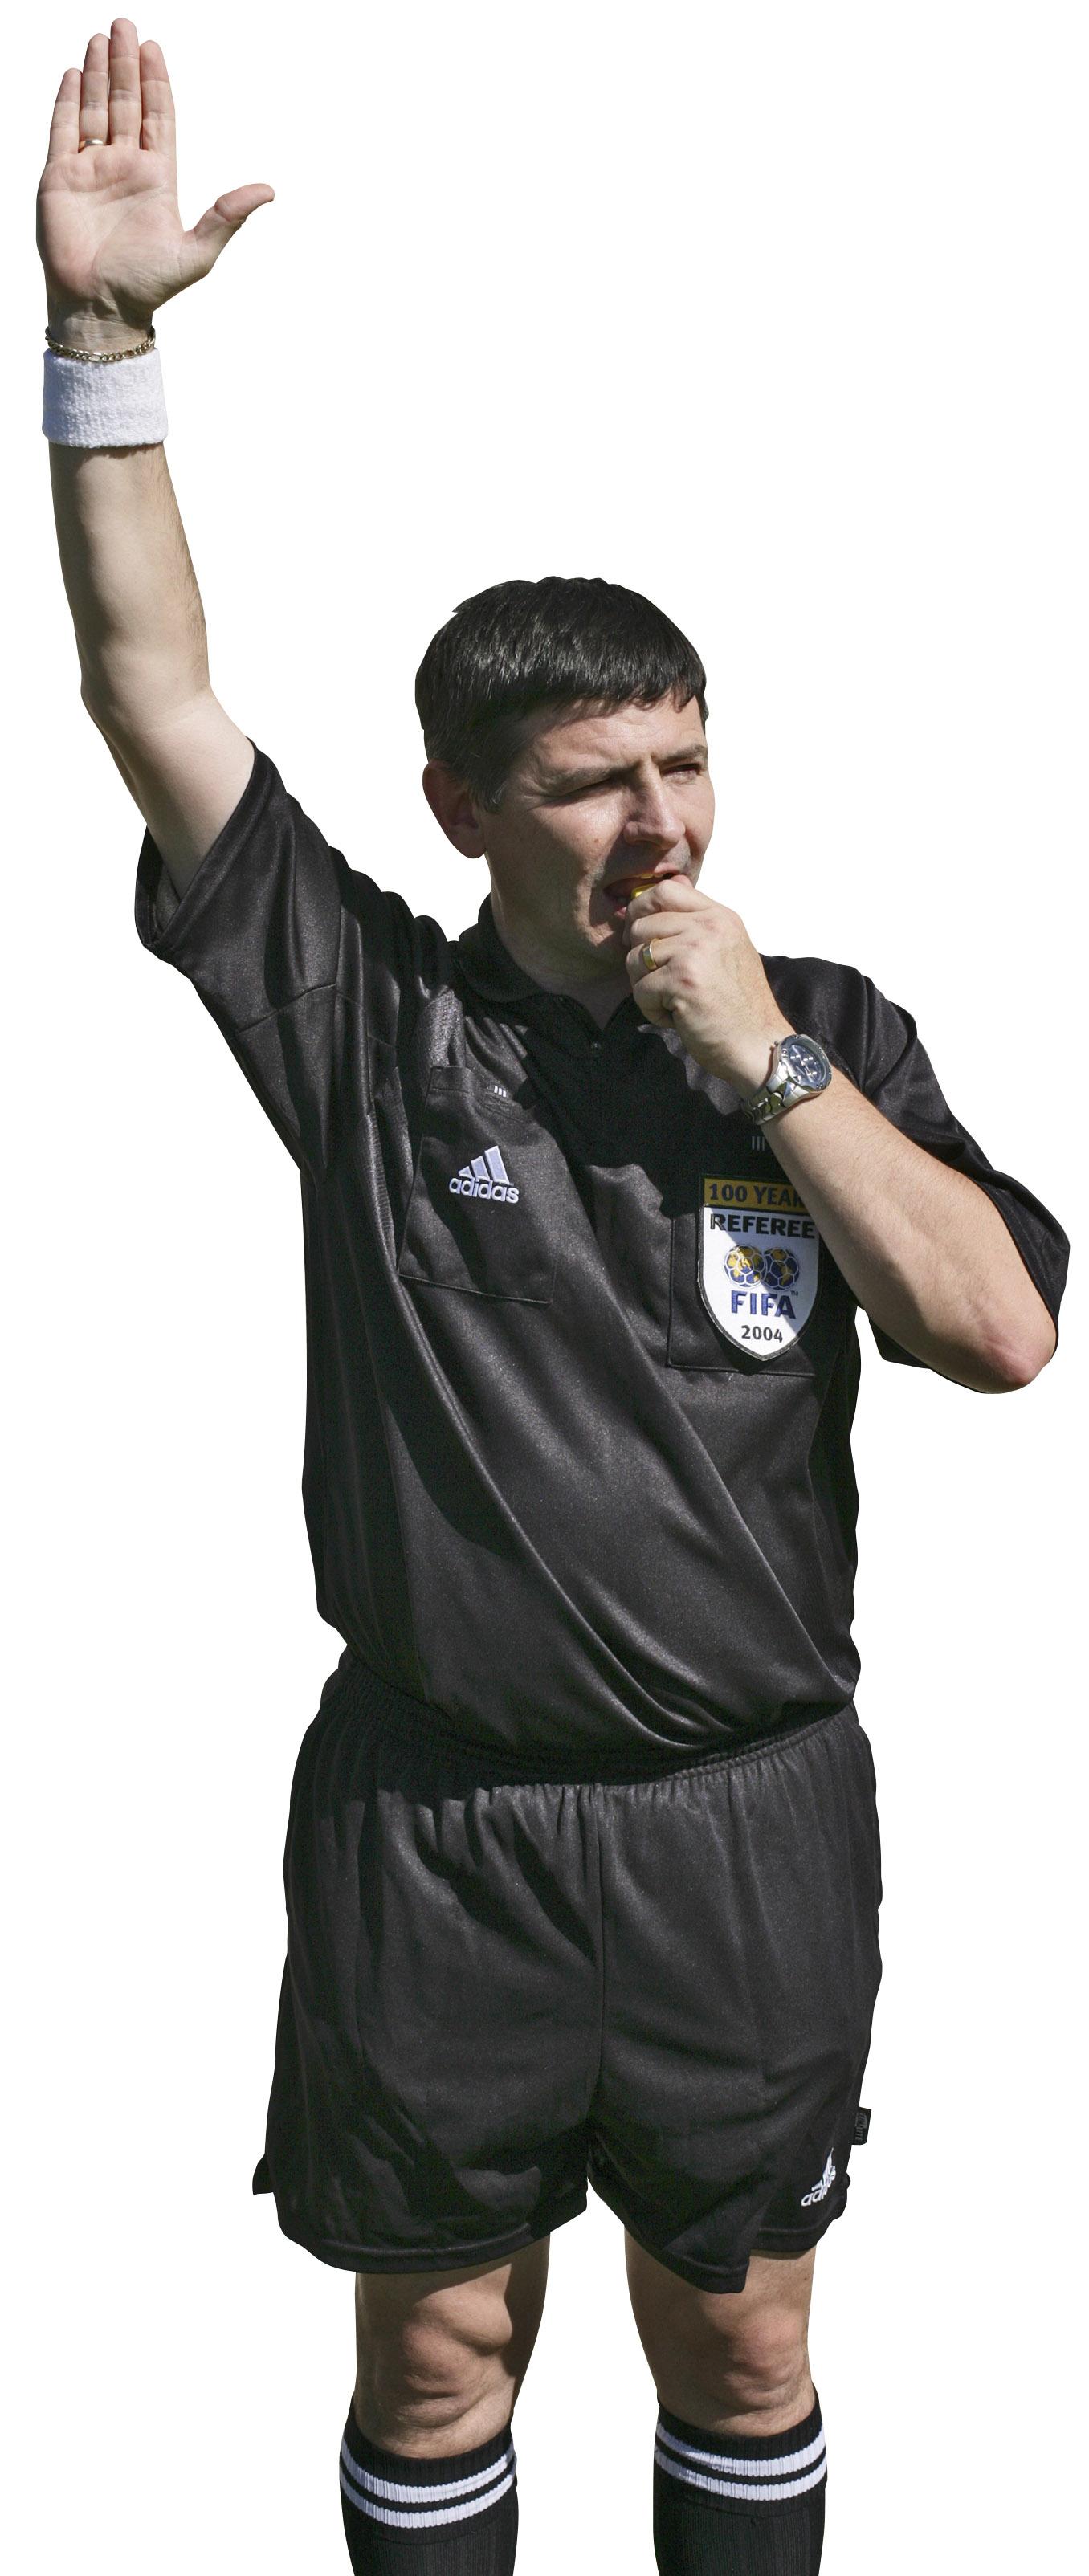 soccer officiating 451 fairview avenue ridgewood, ny 11385 1-855-697-6223 info@refereestorecom.